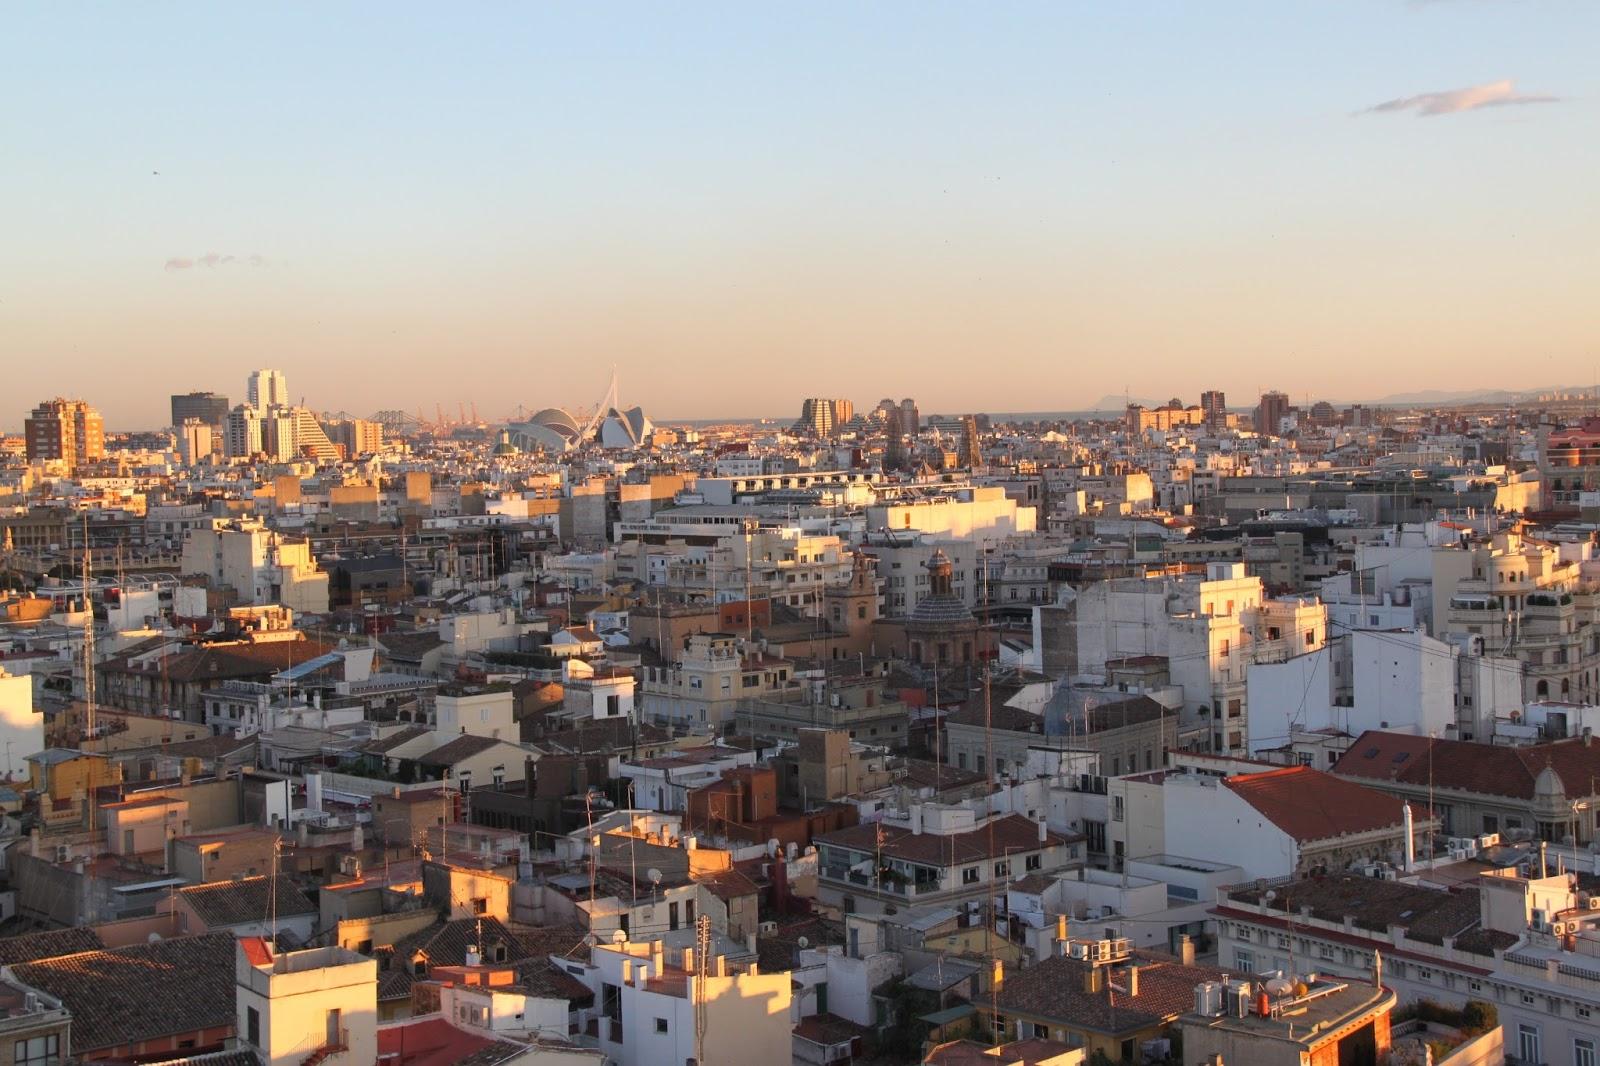 Vista aérea de Valencia